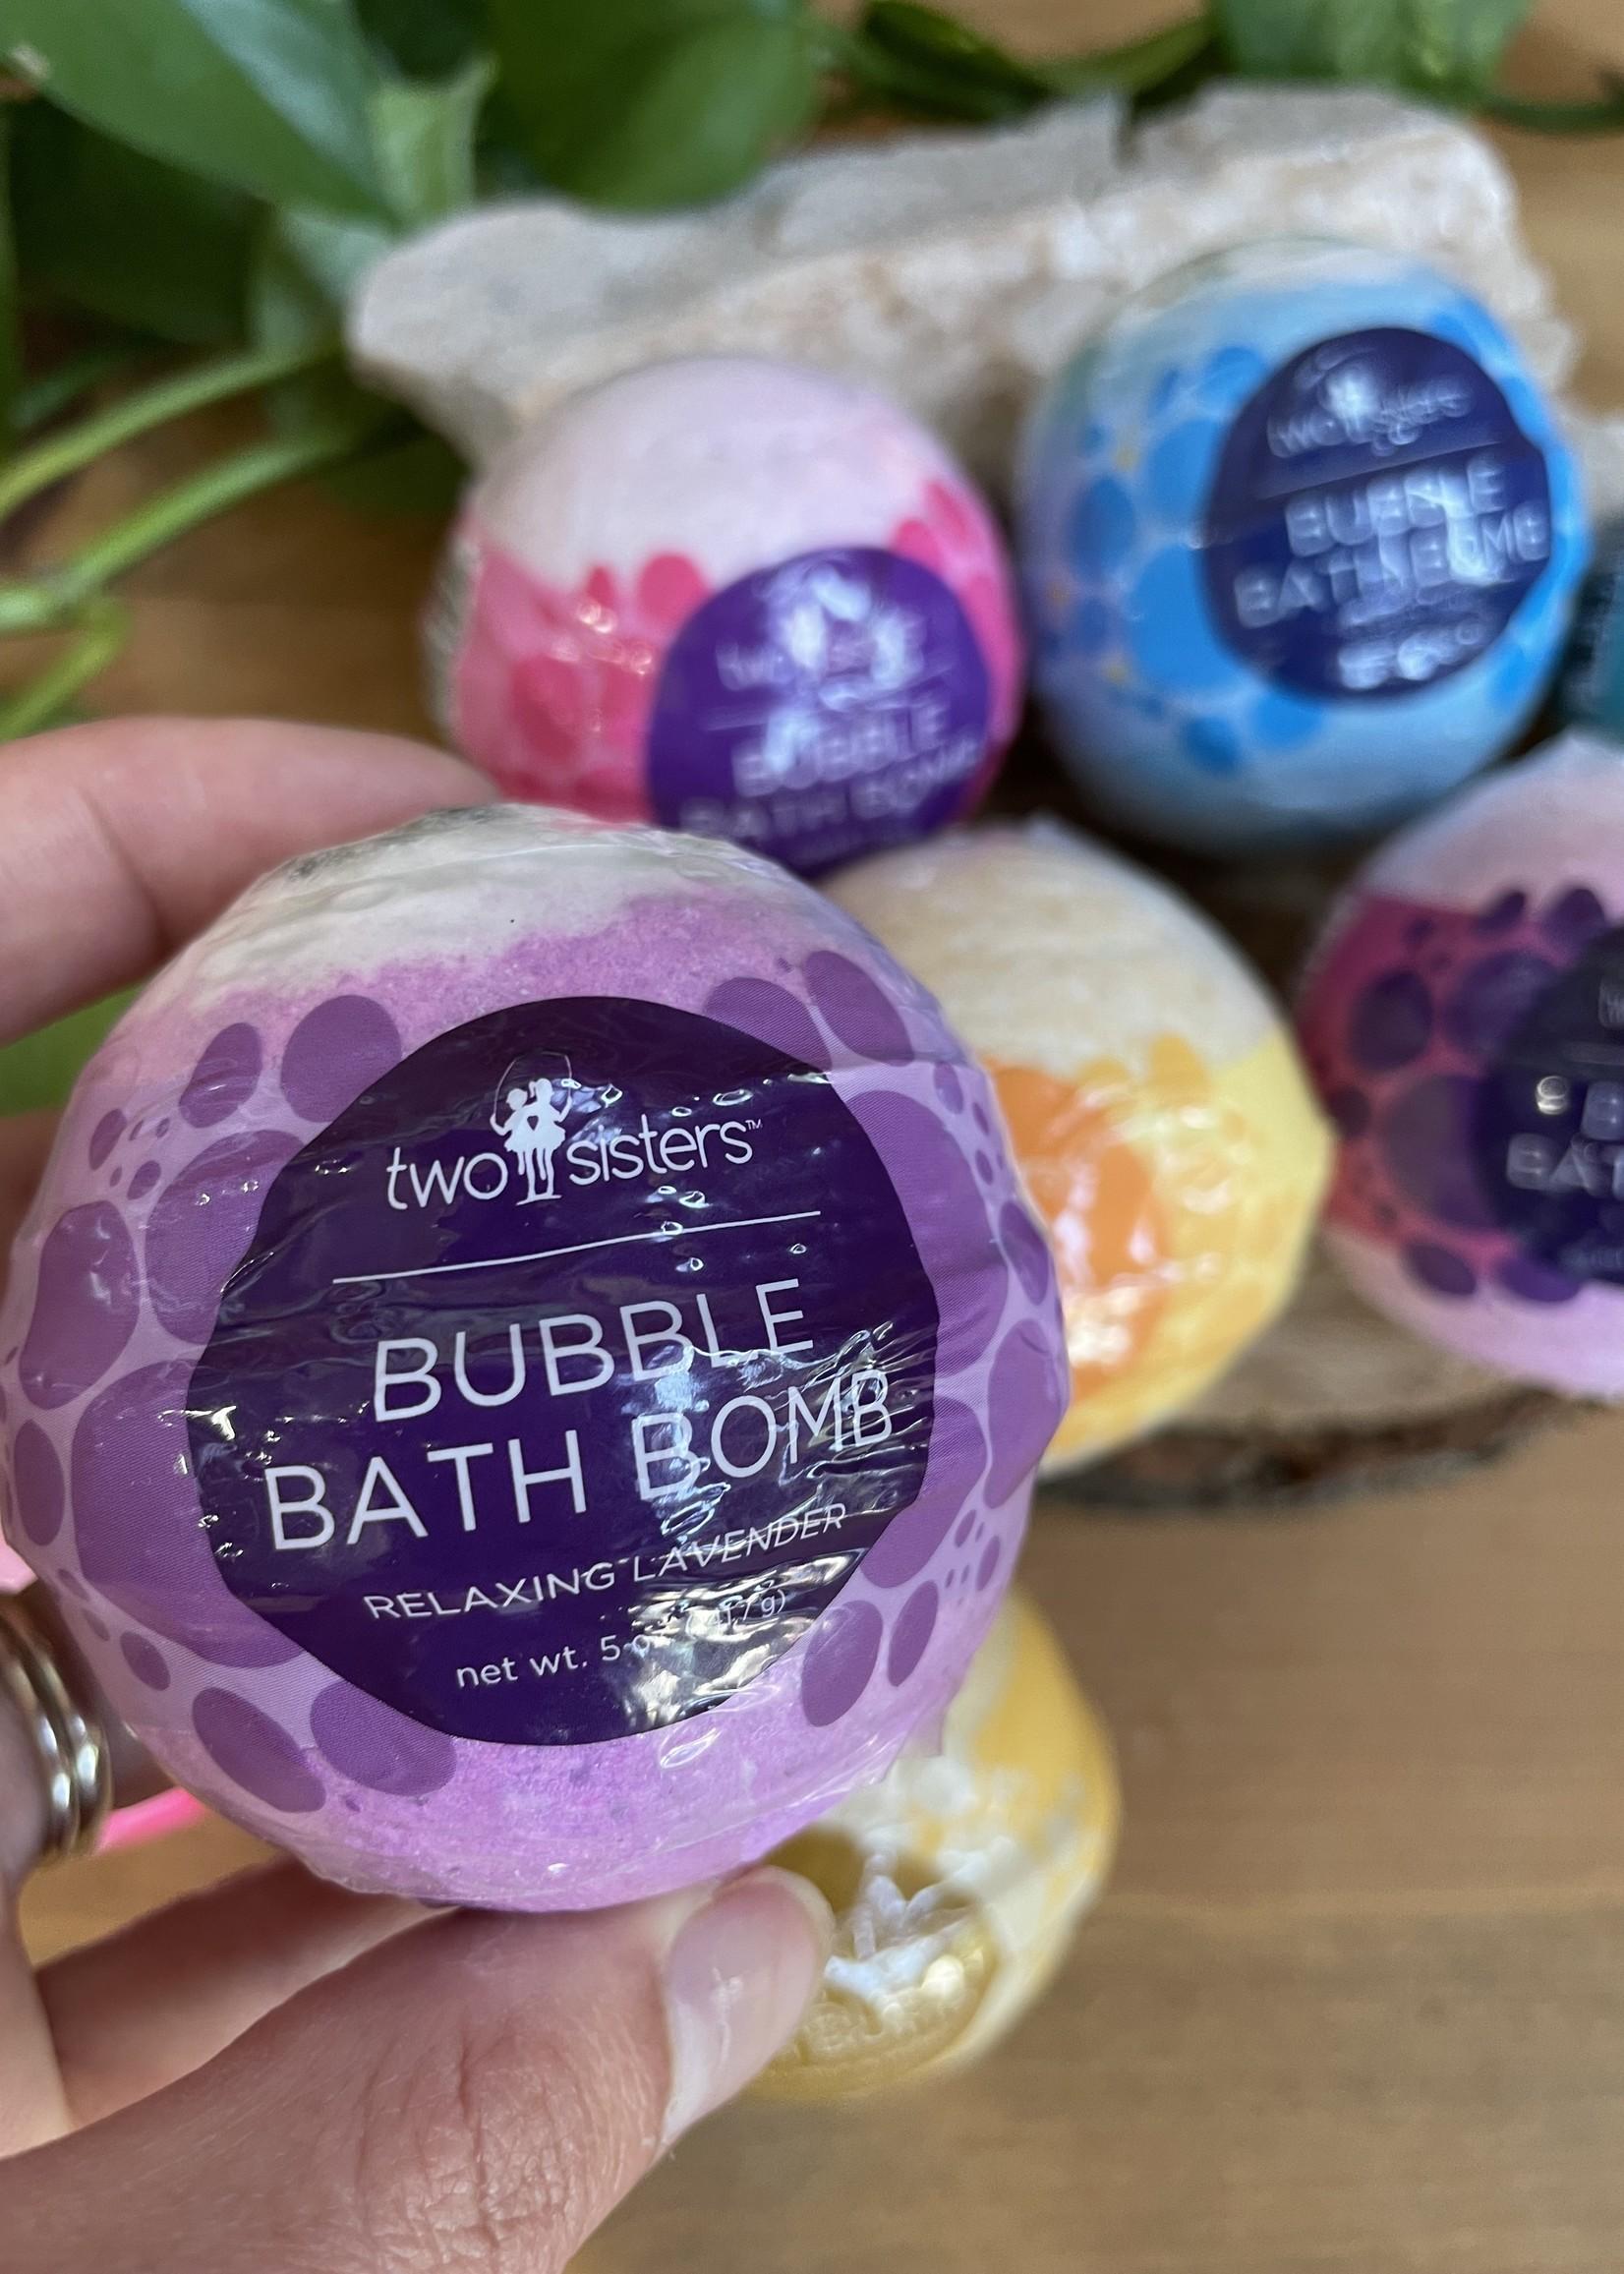 Two Sisters Bubble Bath Bomb